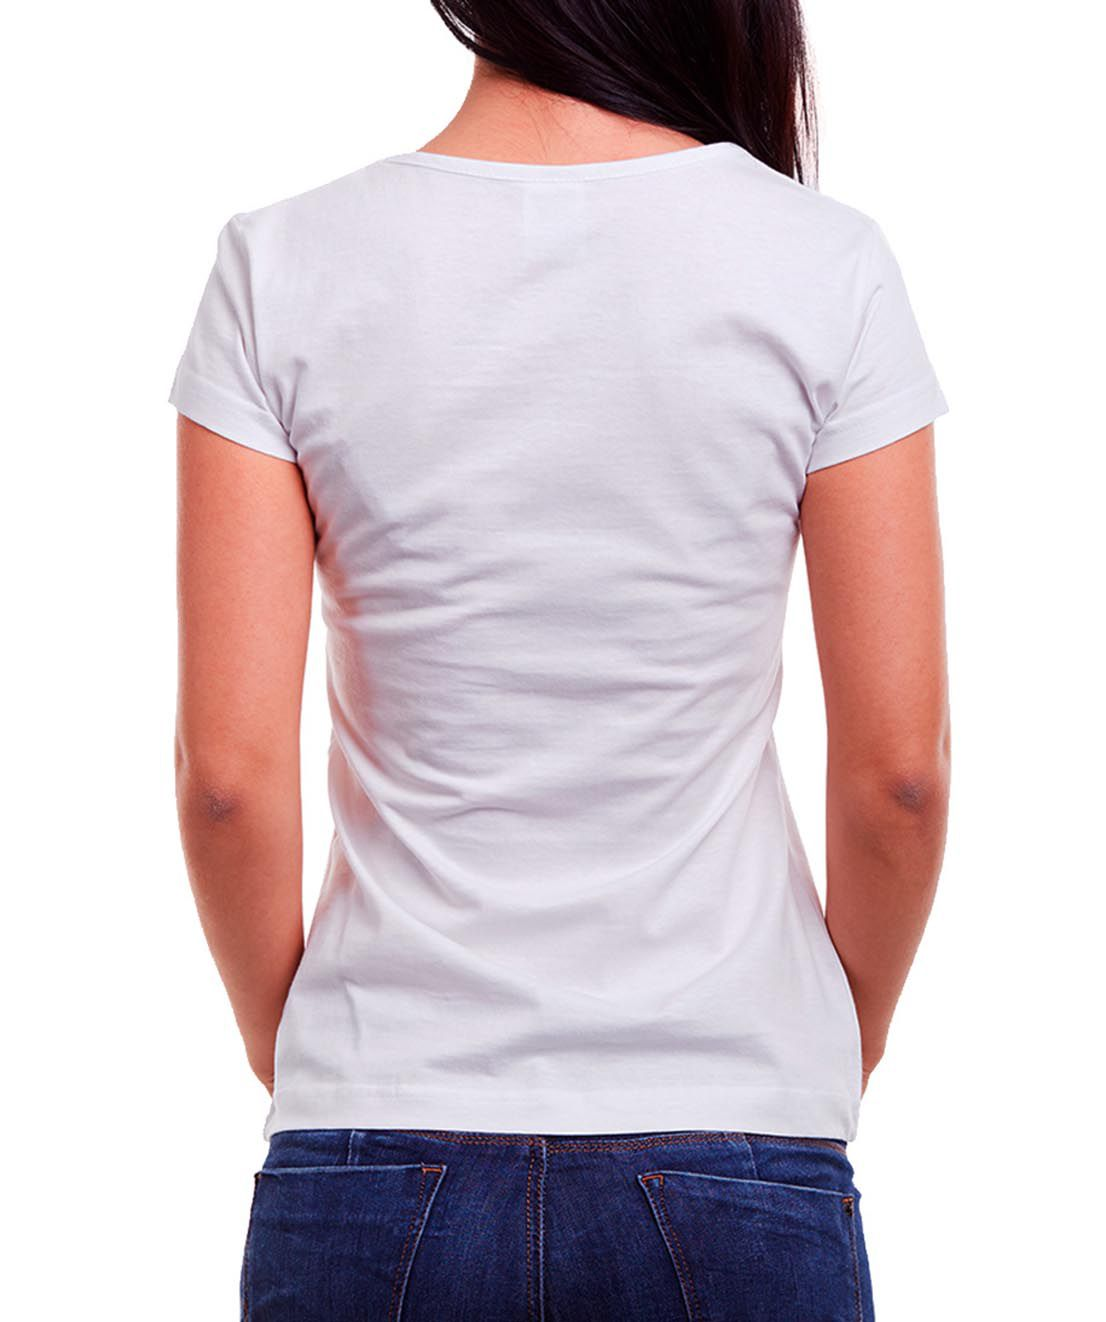 Blusa OutletDri T-Shirt Estampada Girl Power Is Not A Trend Branca